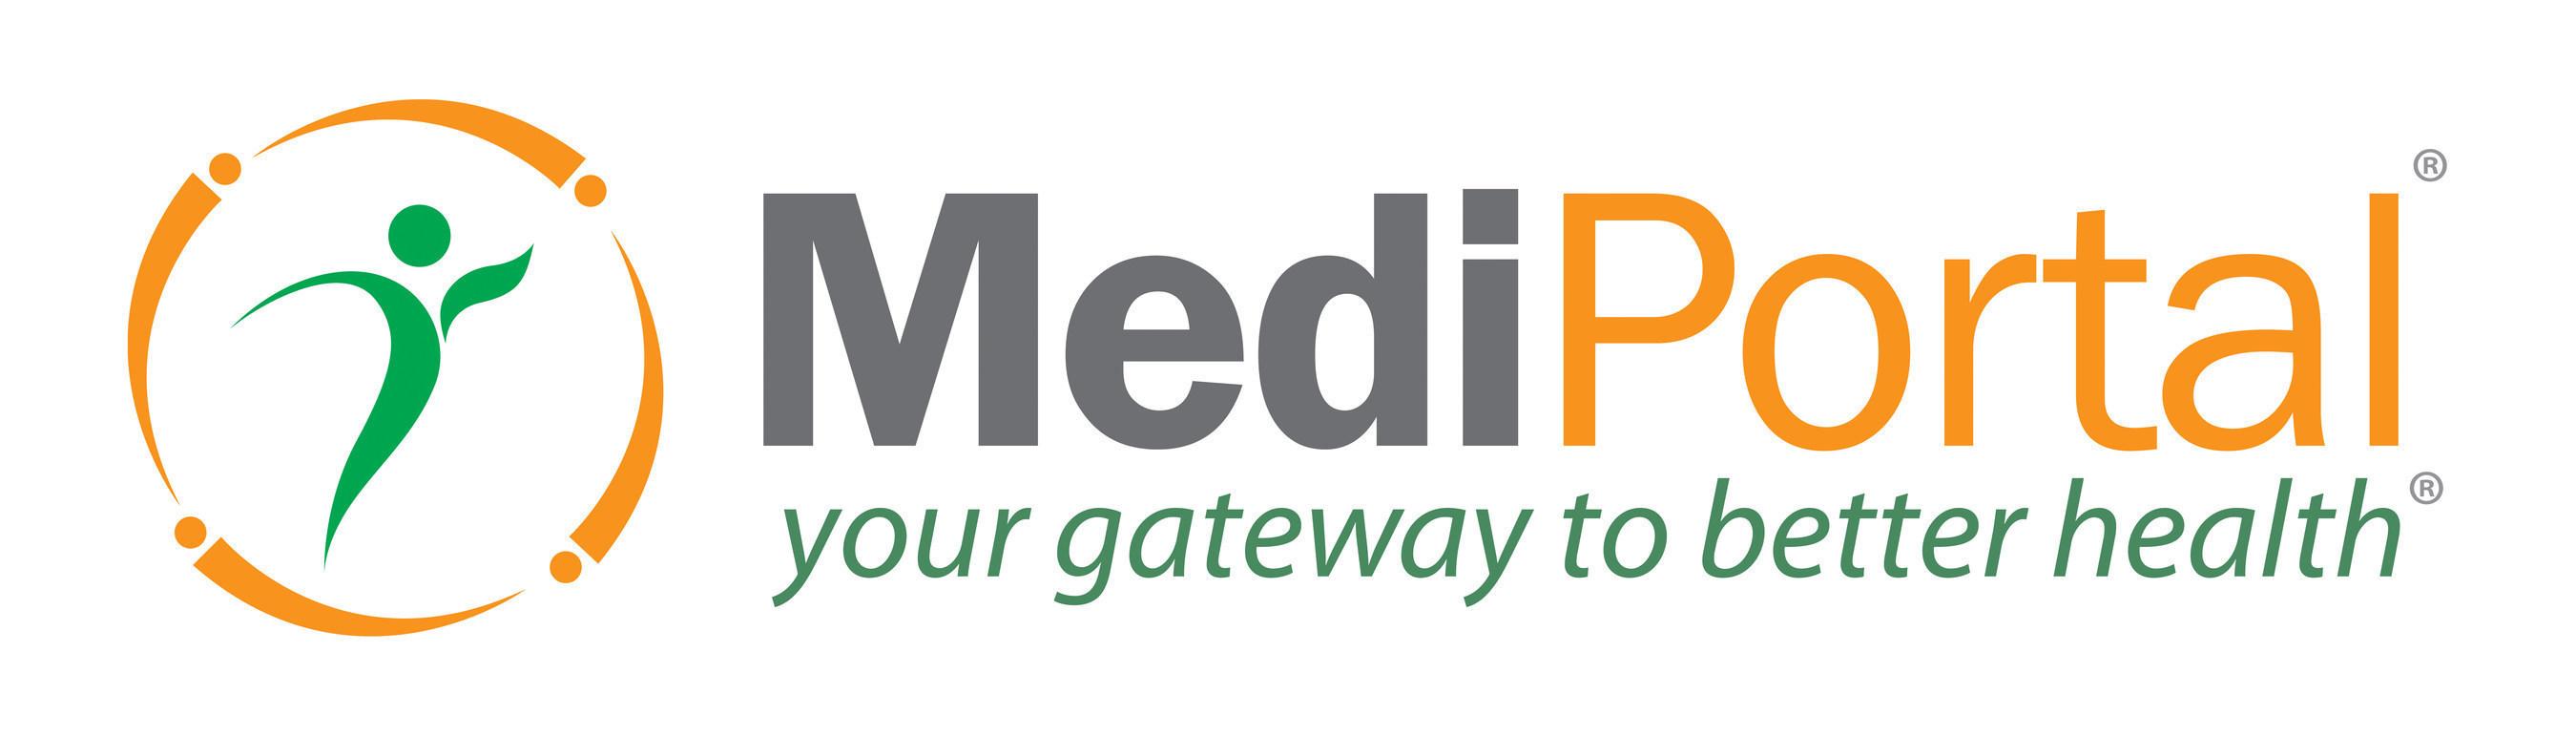 www.mediportal.com